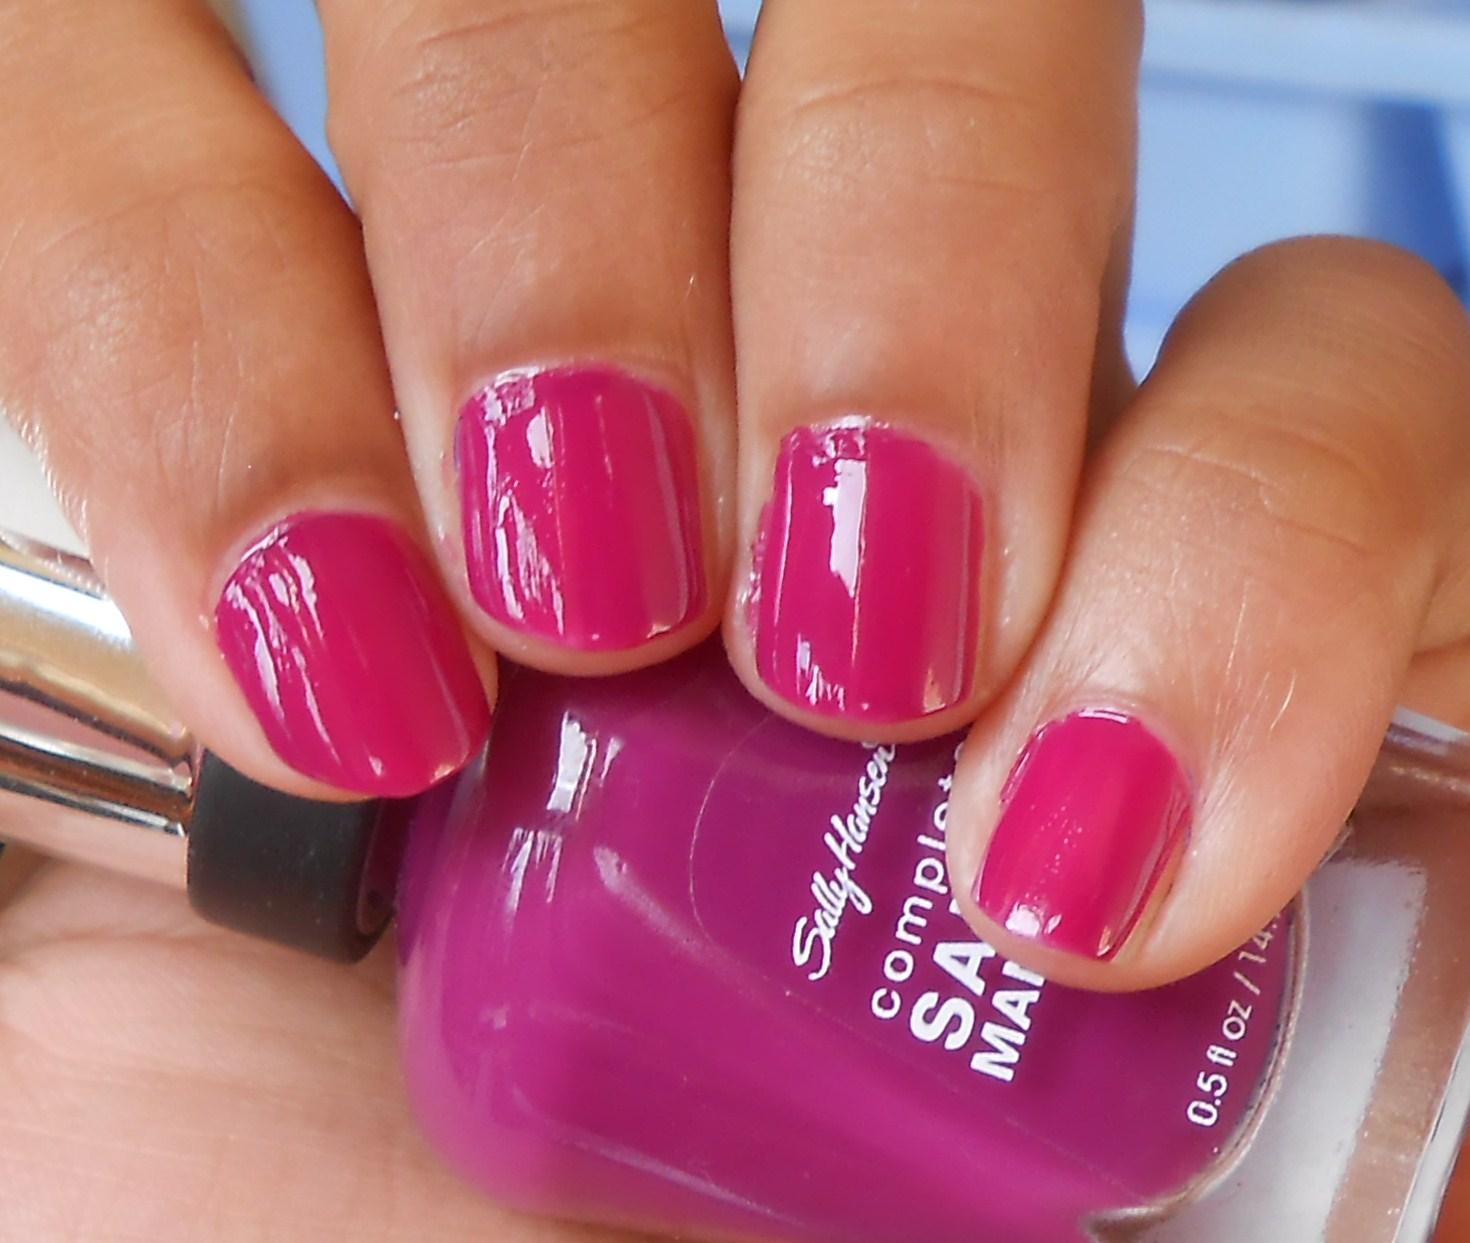 Sally hansen complete salon manicure nail polish swatches for Salon manicure